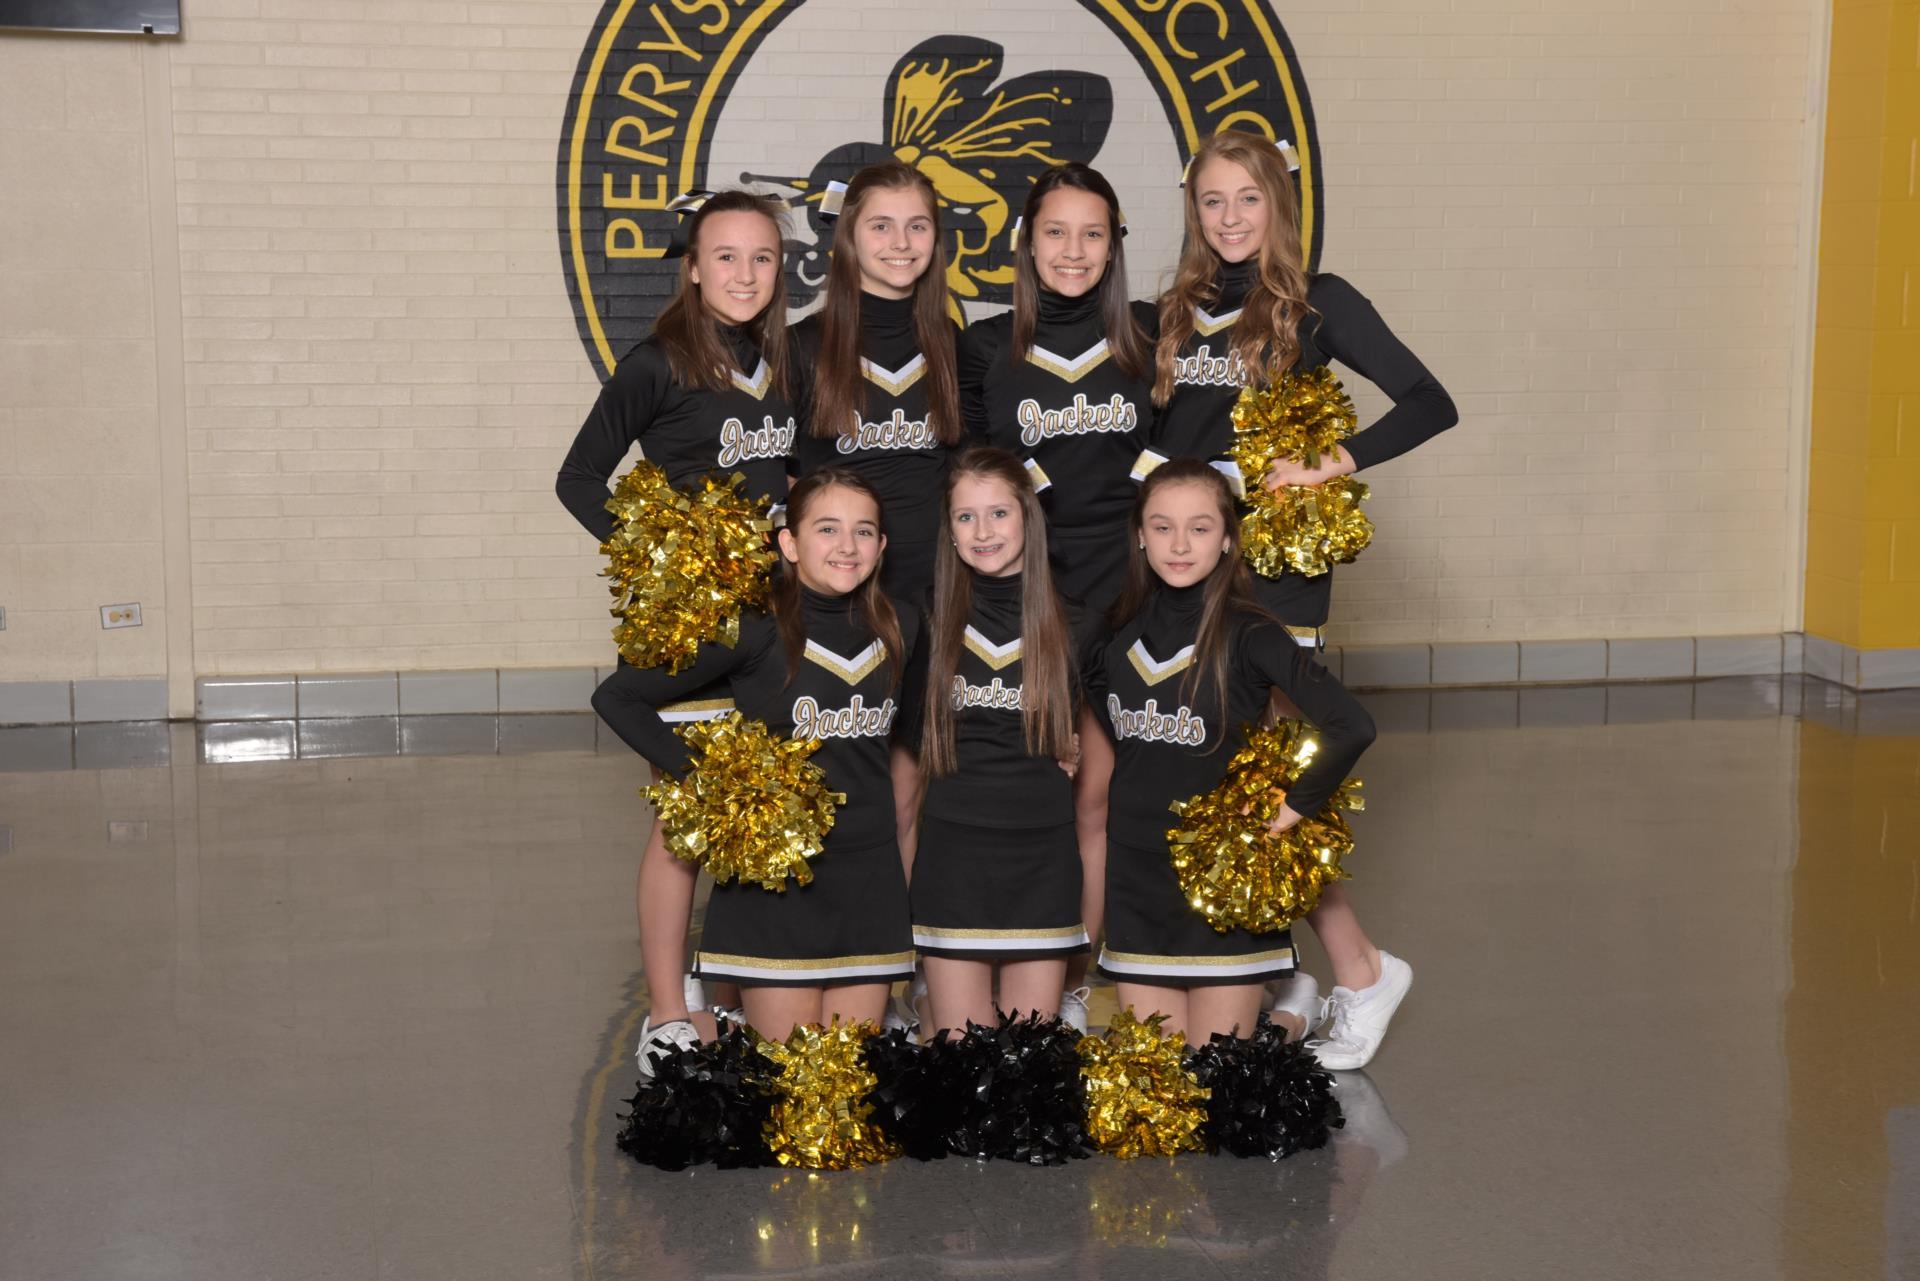 2017 8th grade basketball cheerleaders